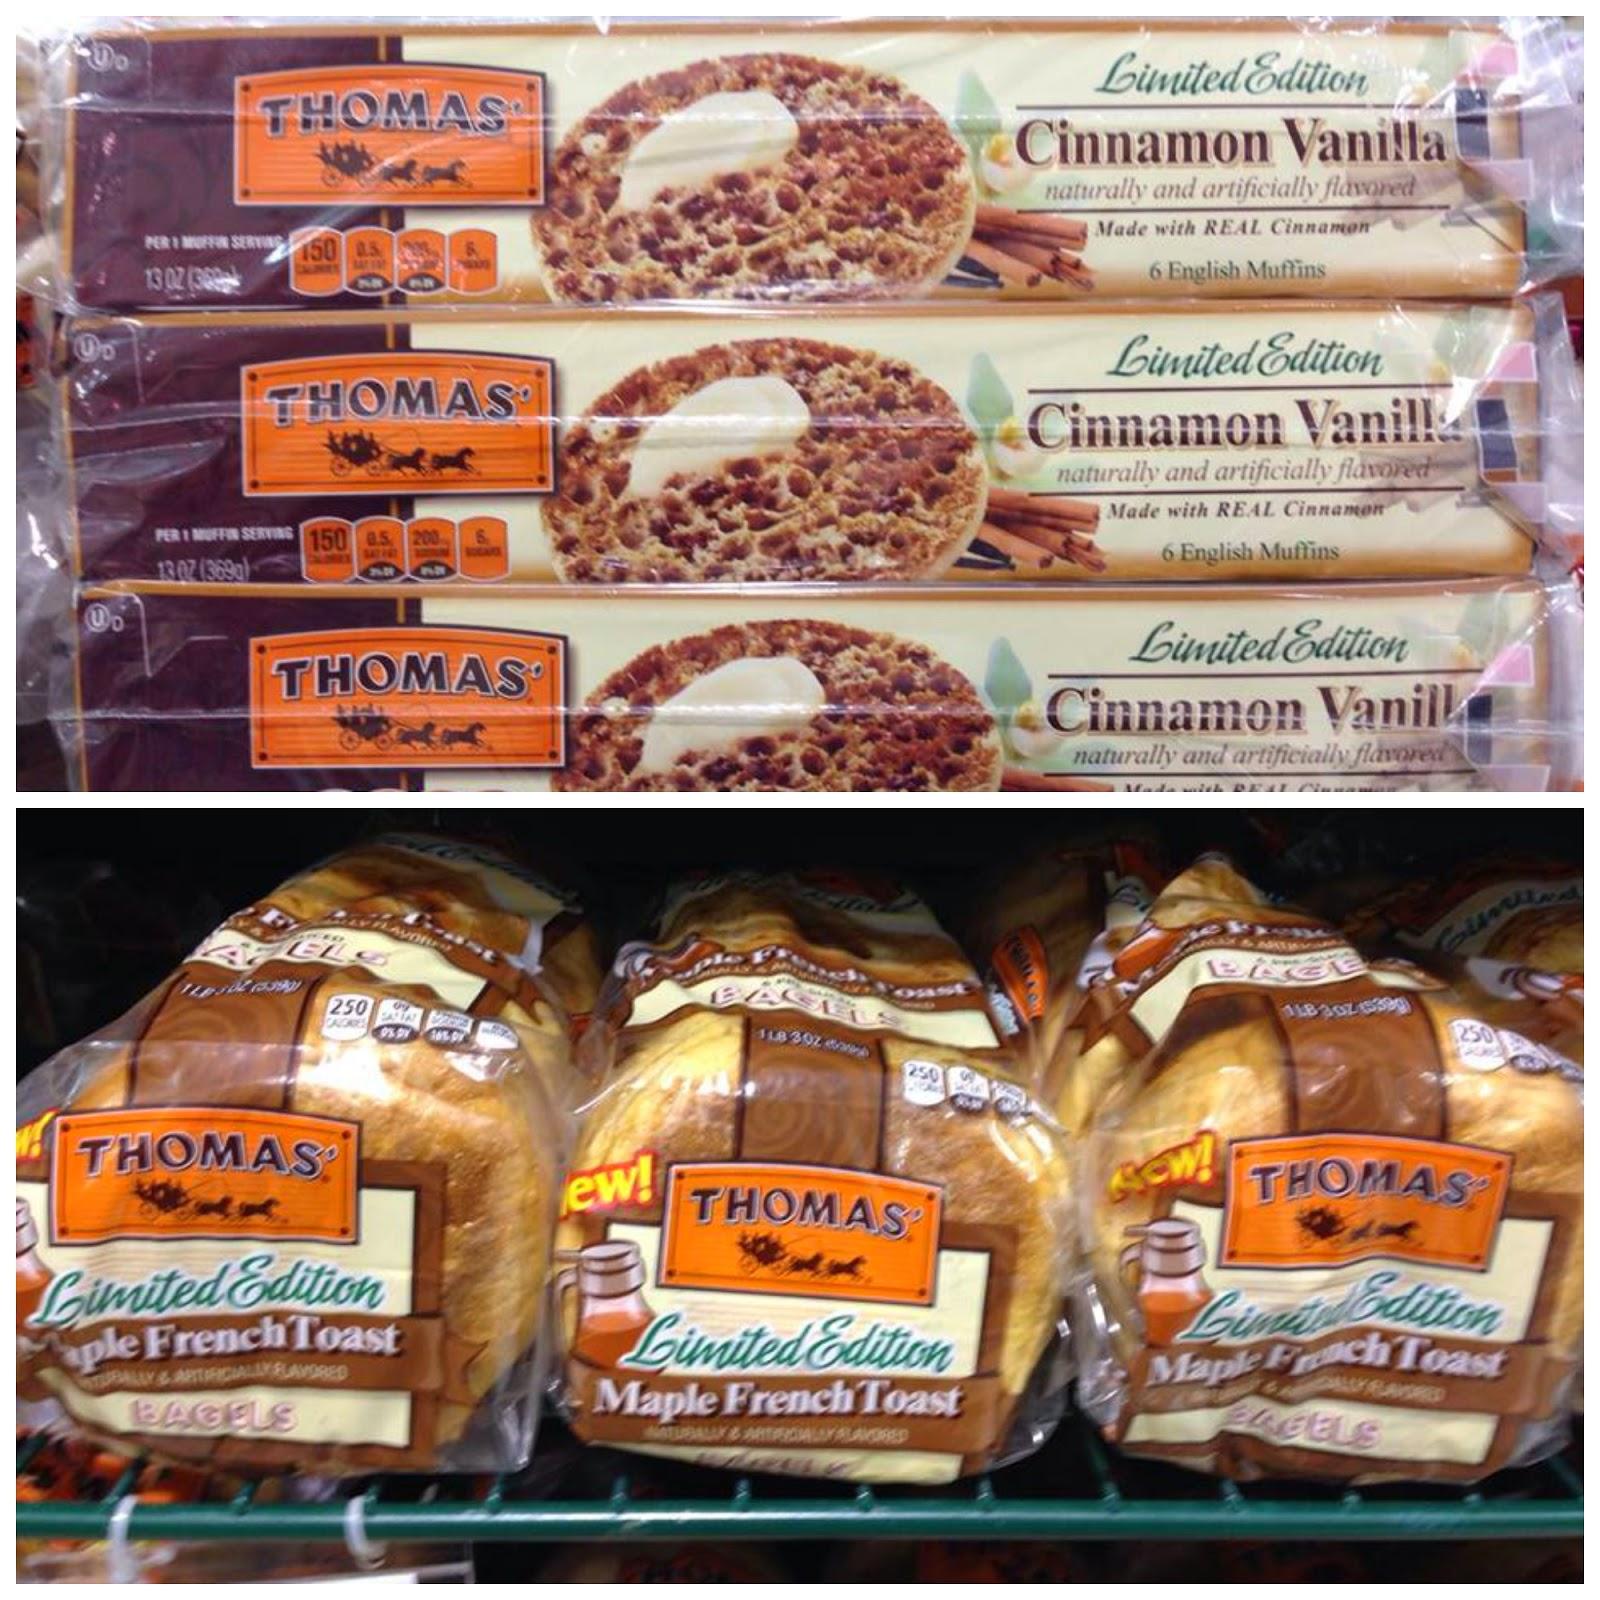 Thomas' English Muffins